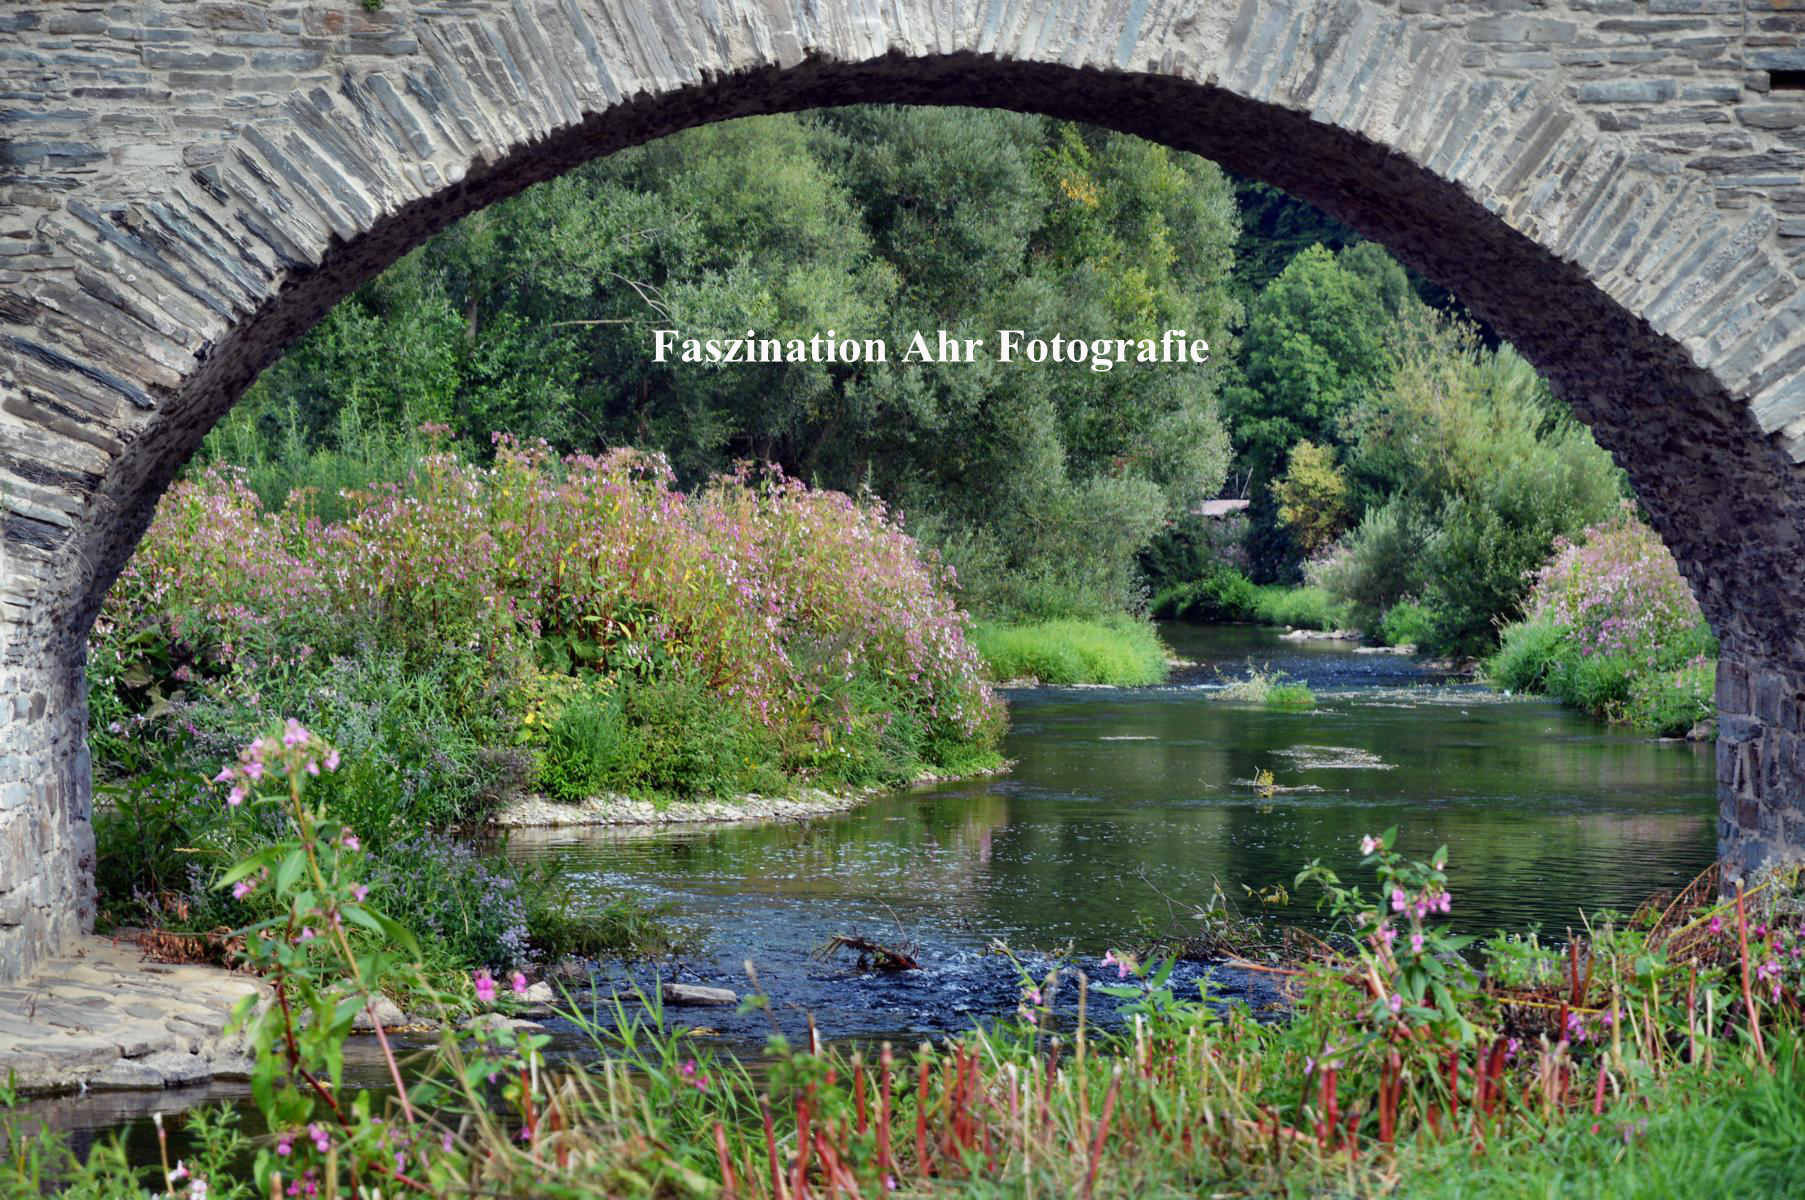 Nepomukbrücke in Rech